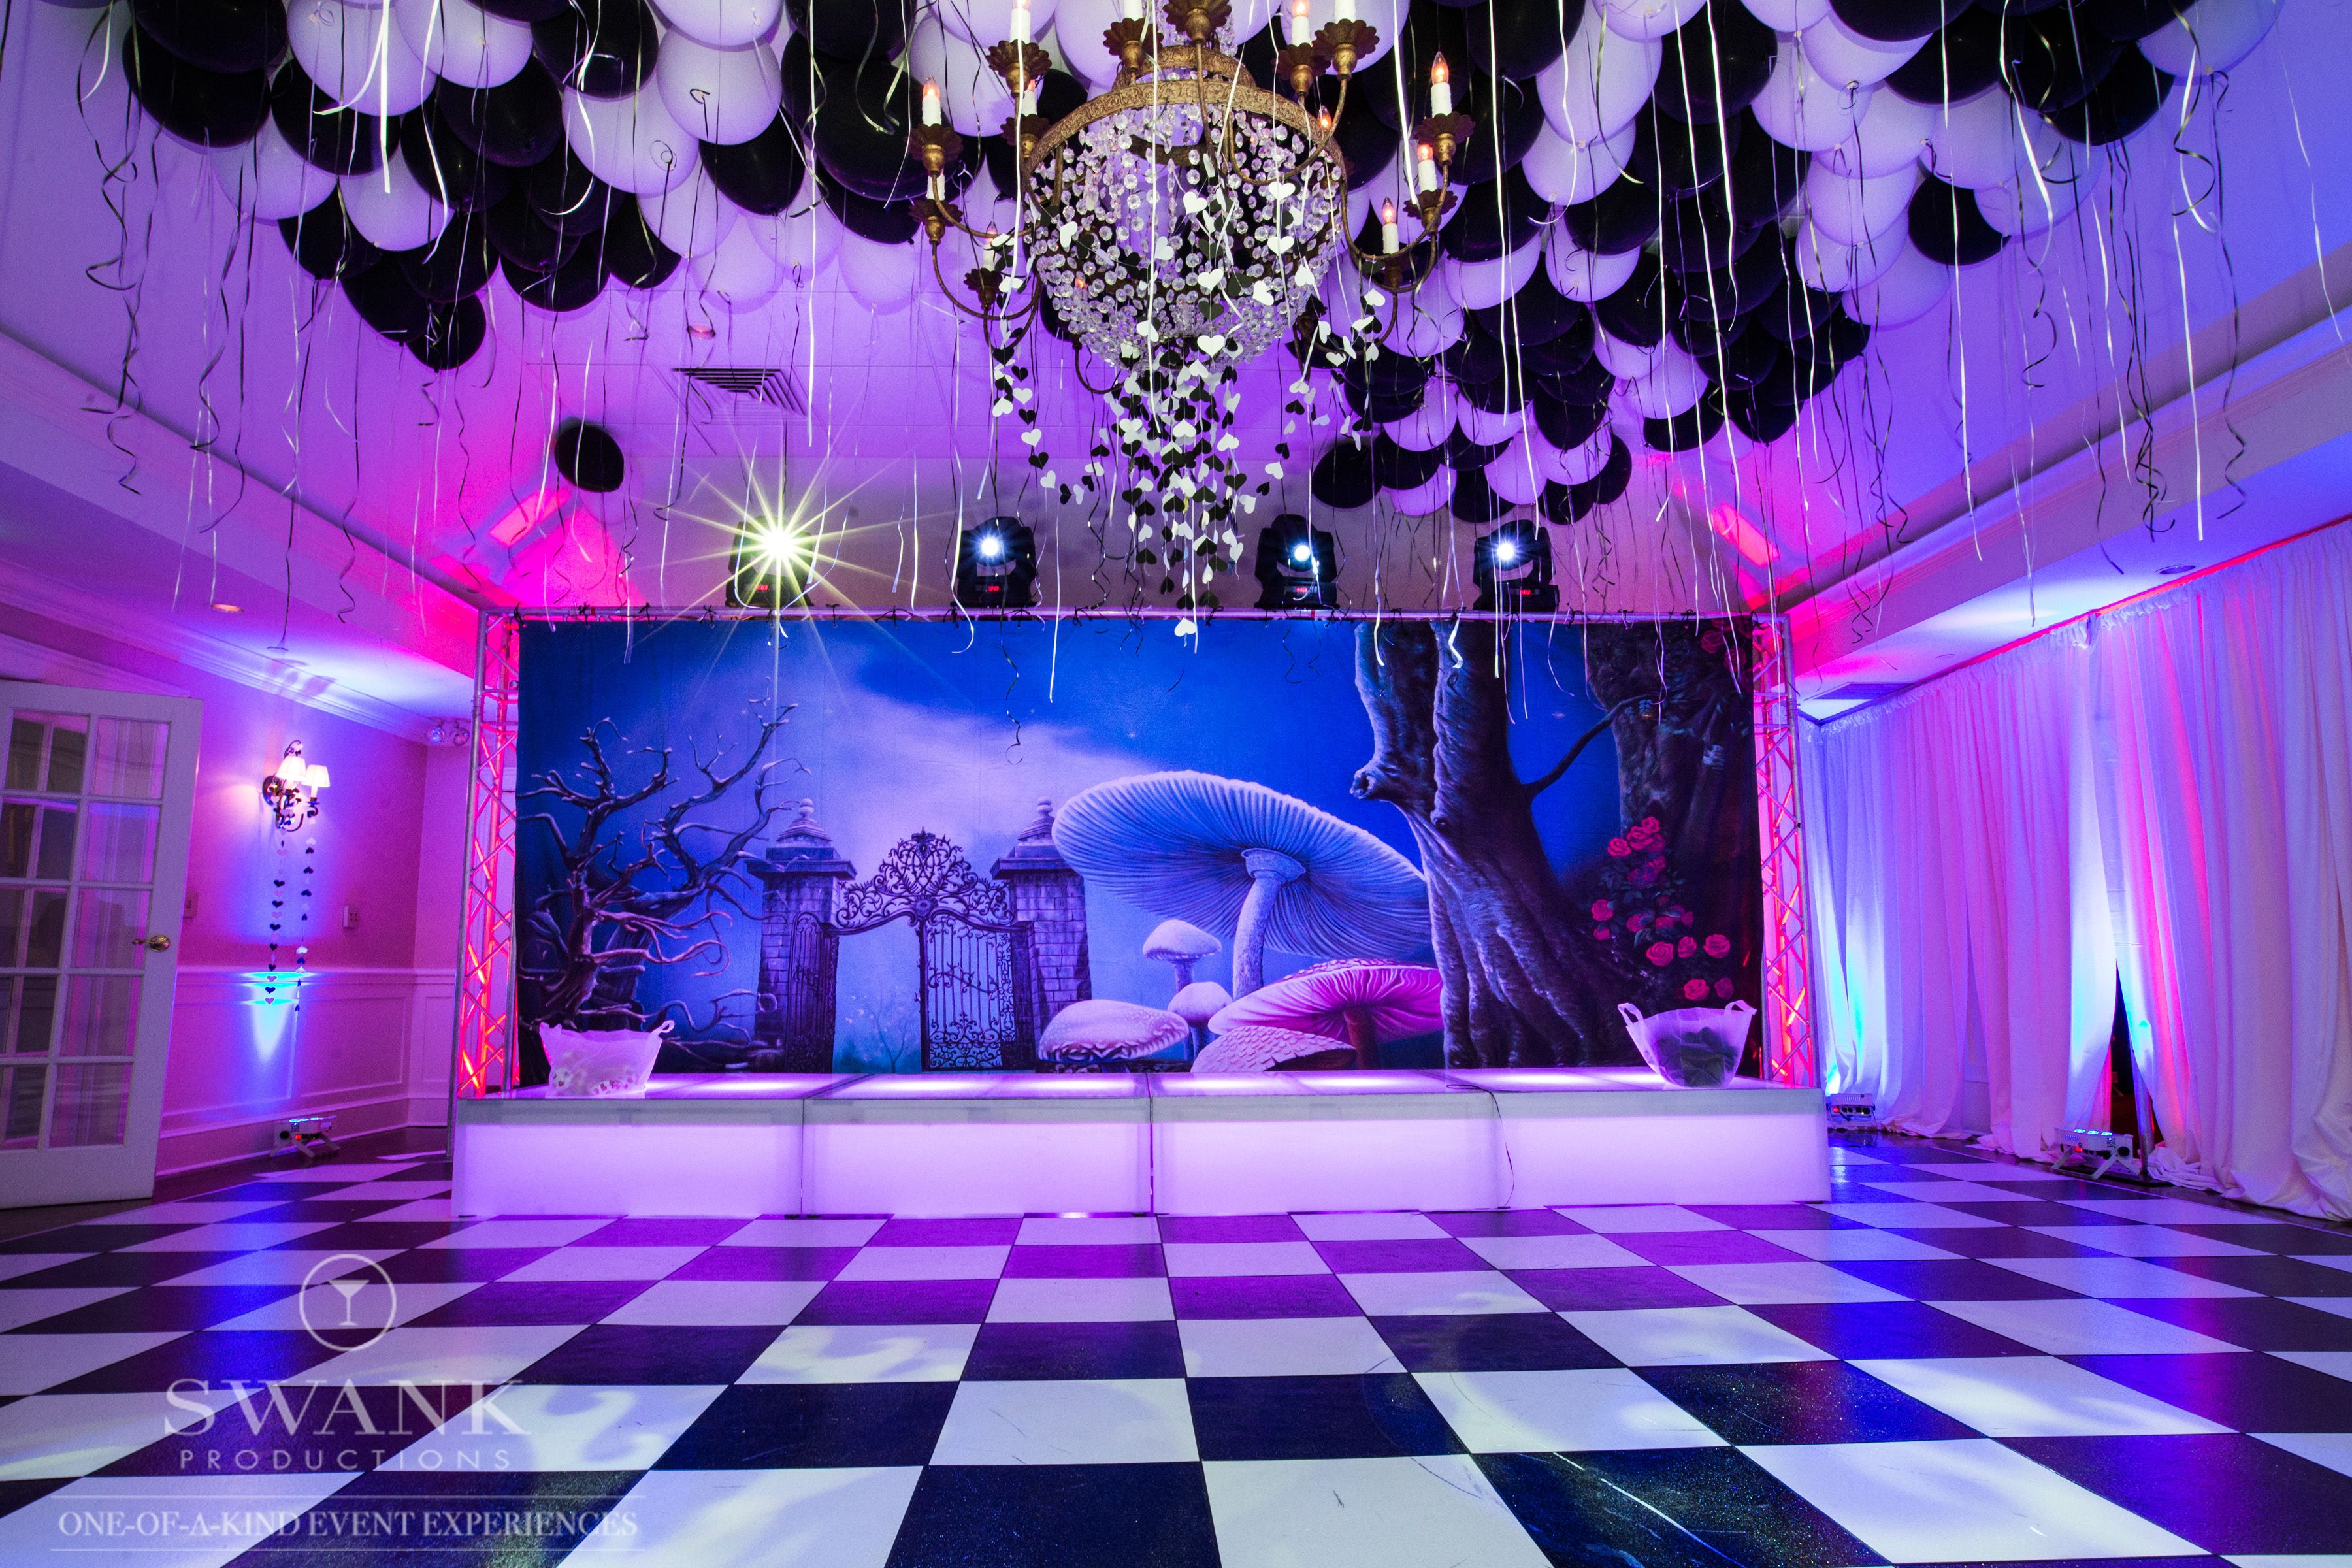 Related Image Alice In Wonderland Theme Wonderland Party Bat Mitzvah Party